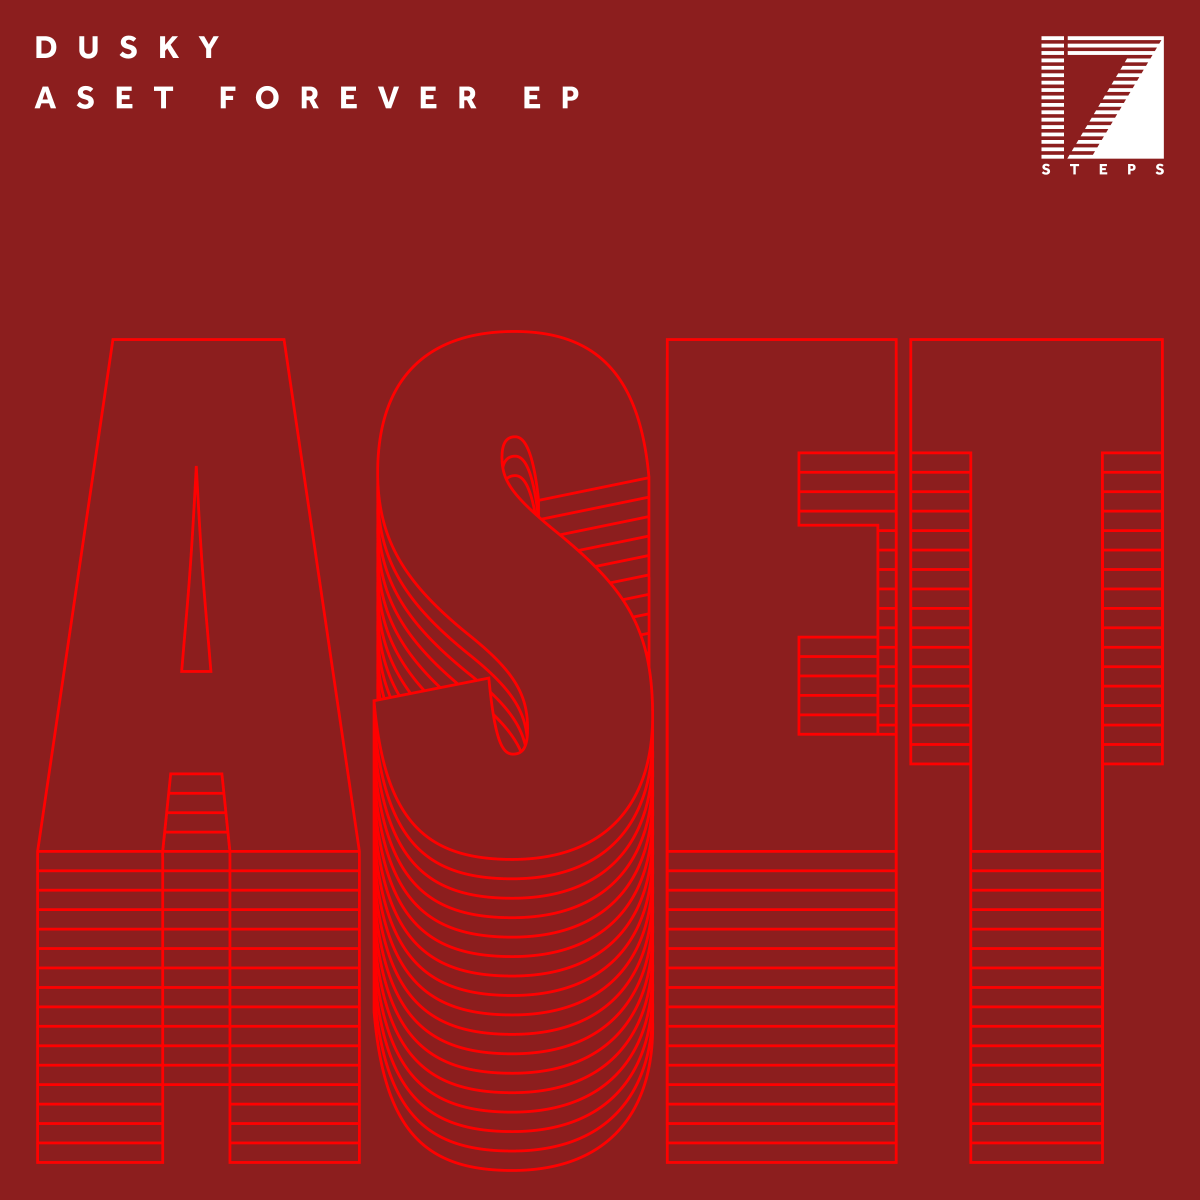 Dusky - Aset Forever EP - Packshot - Front